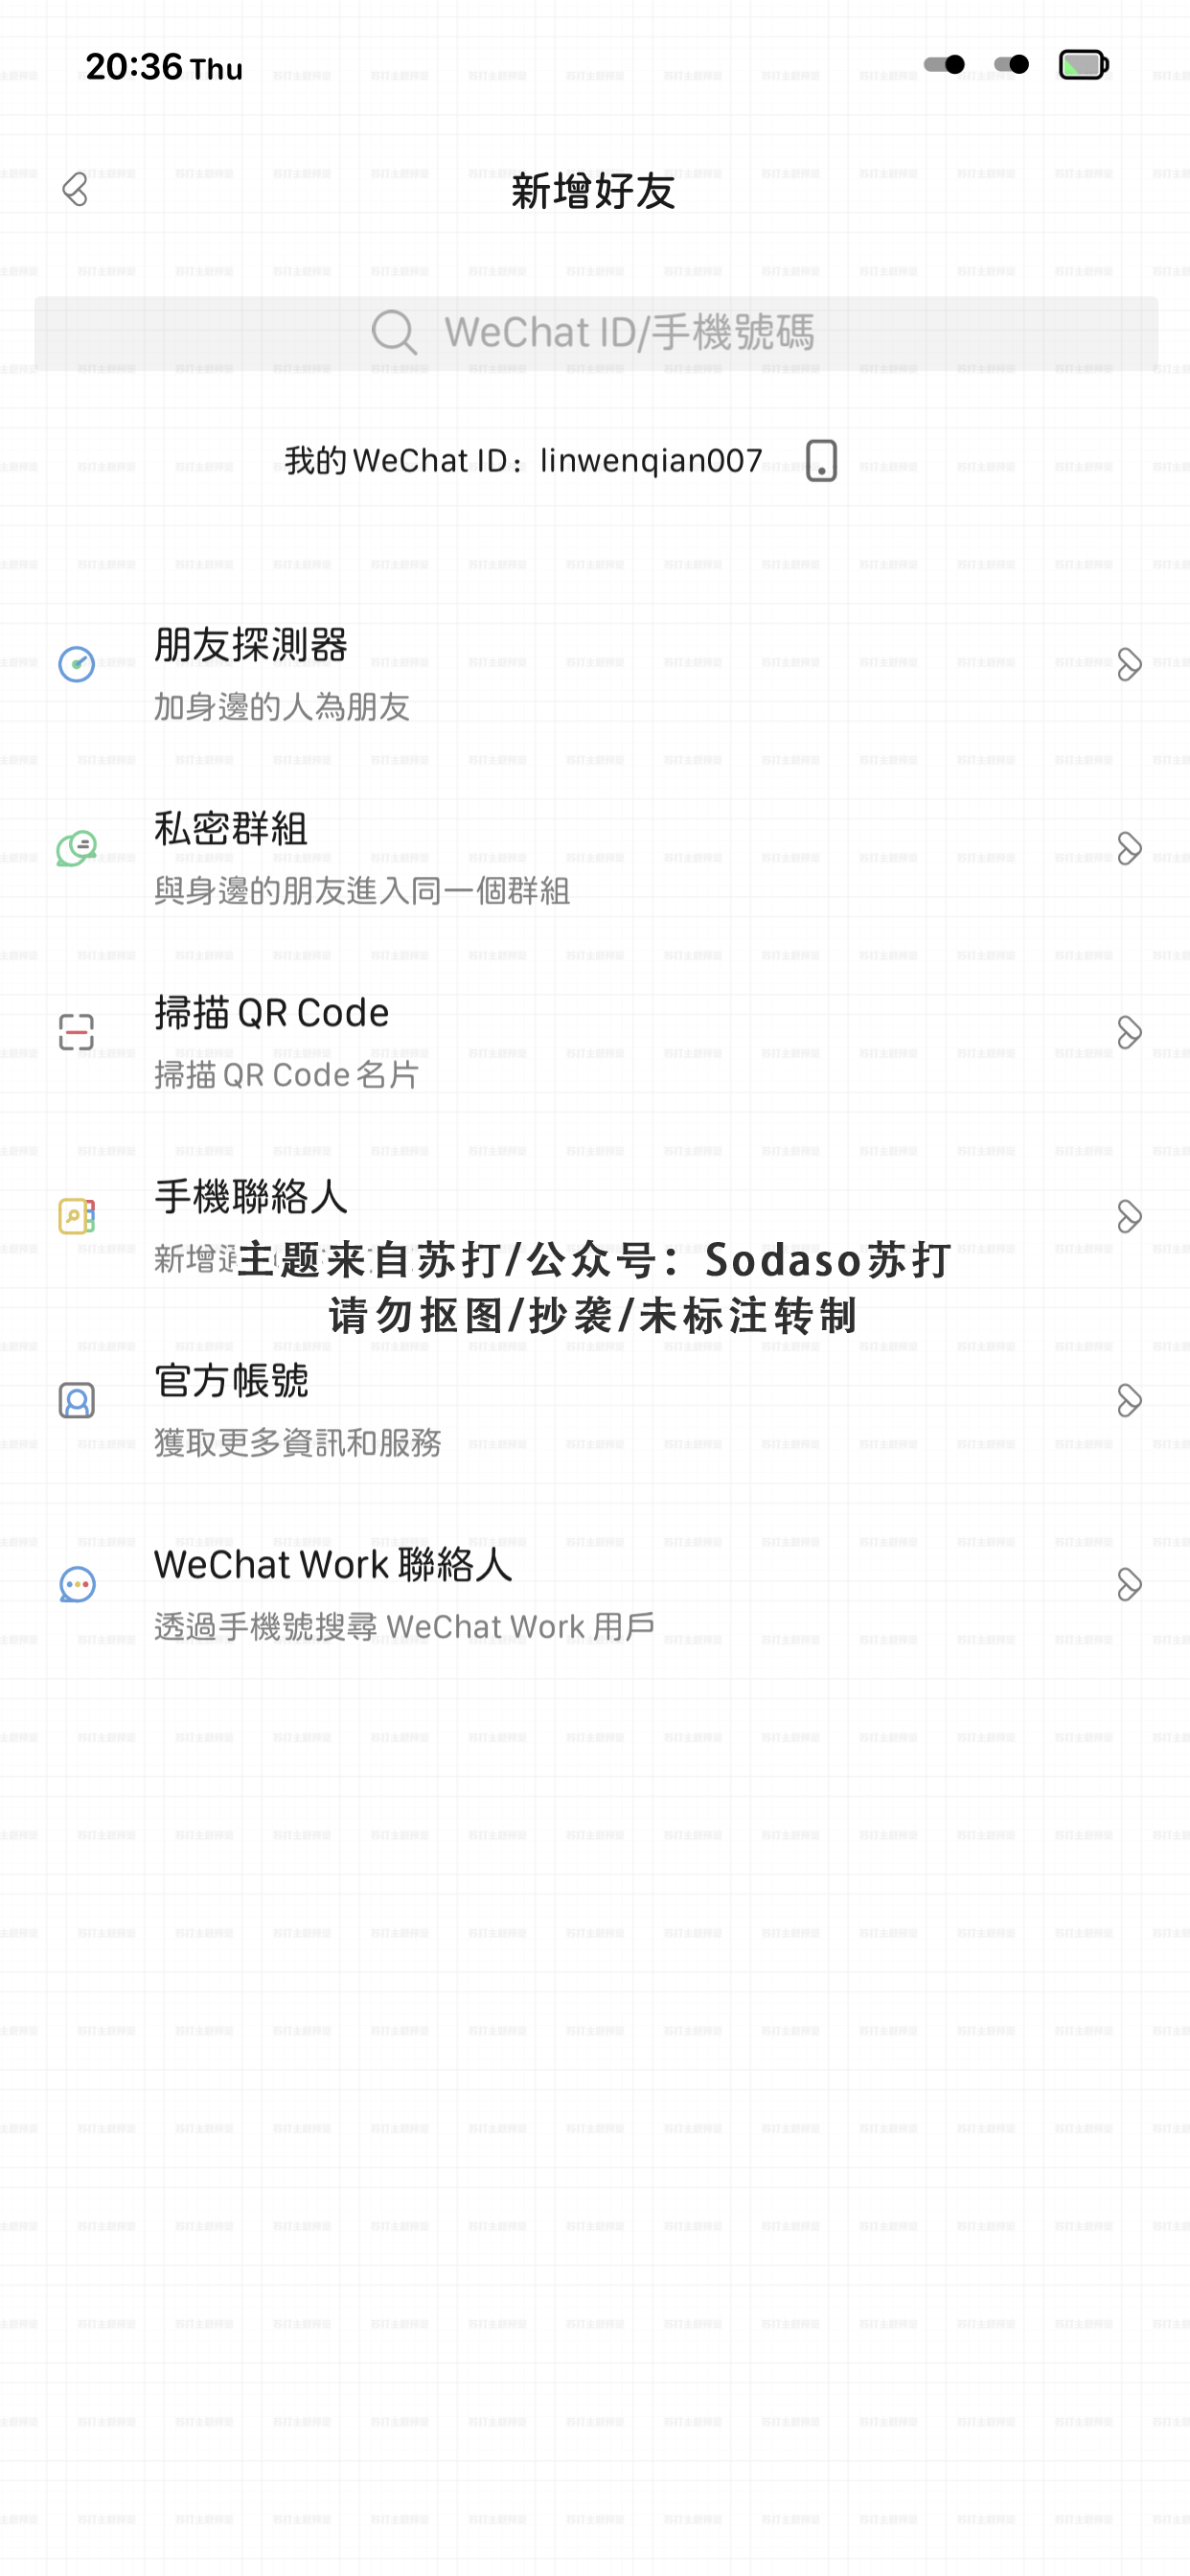 Neon2020 WeChatTheme(微信主题) - 2.0